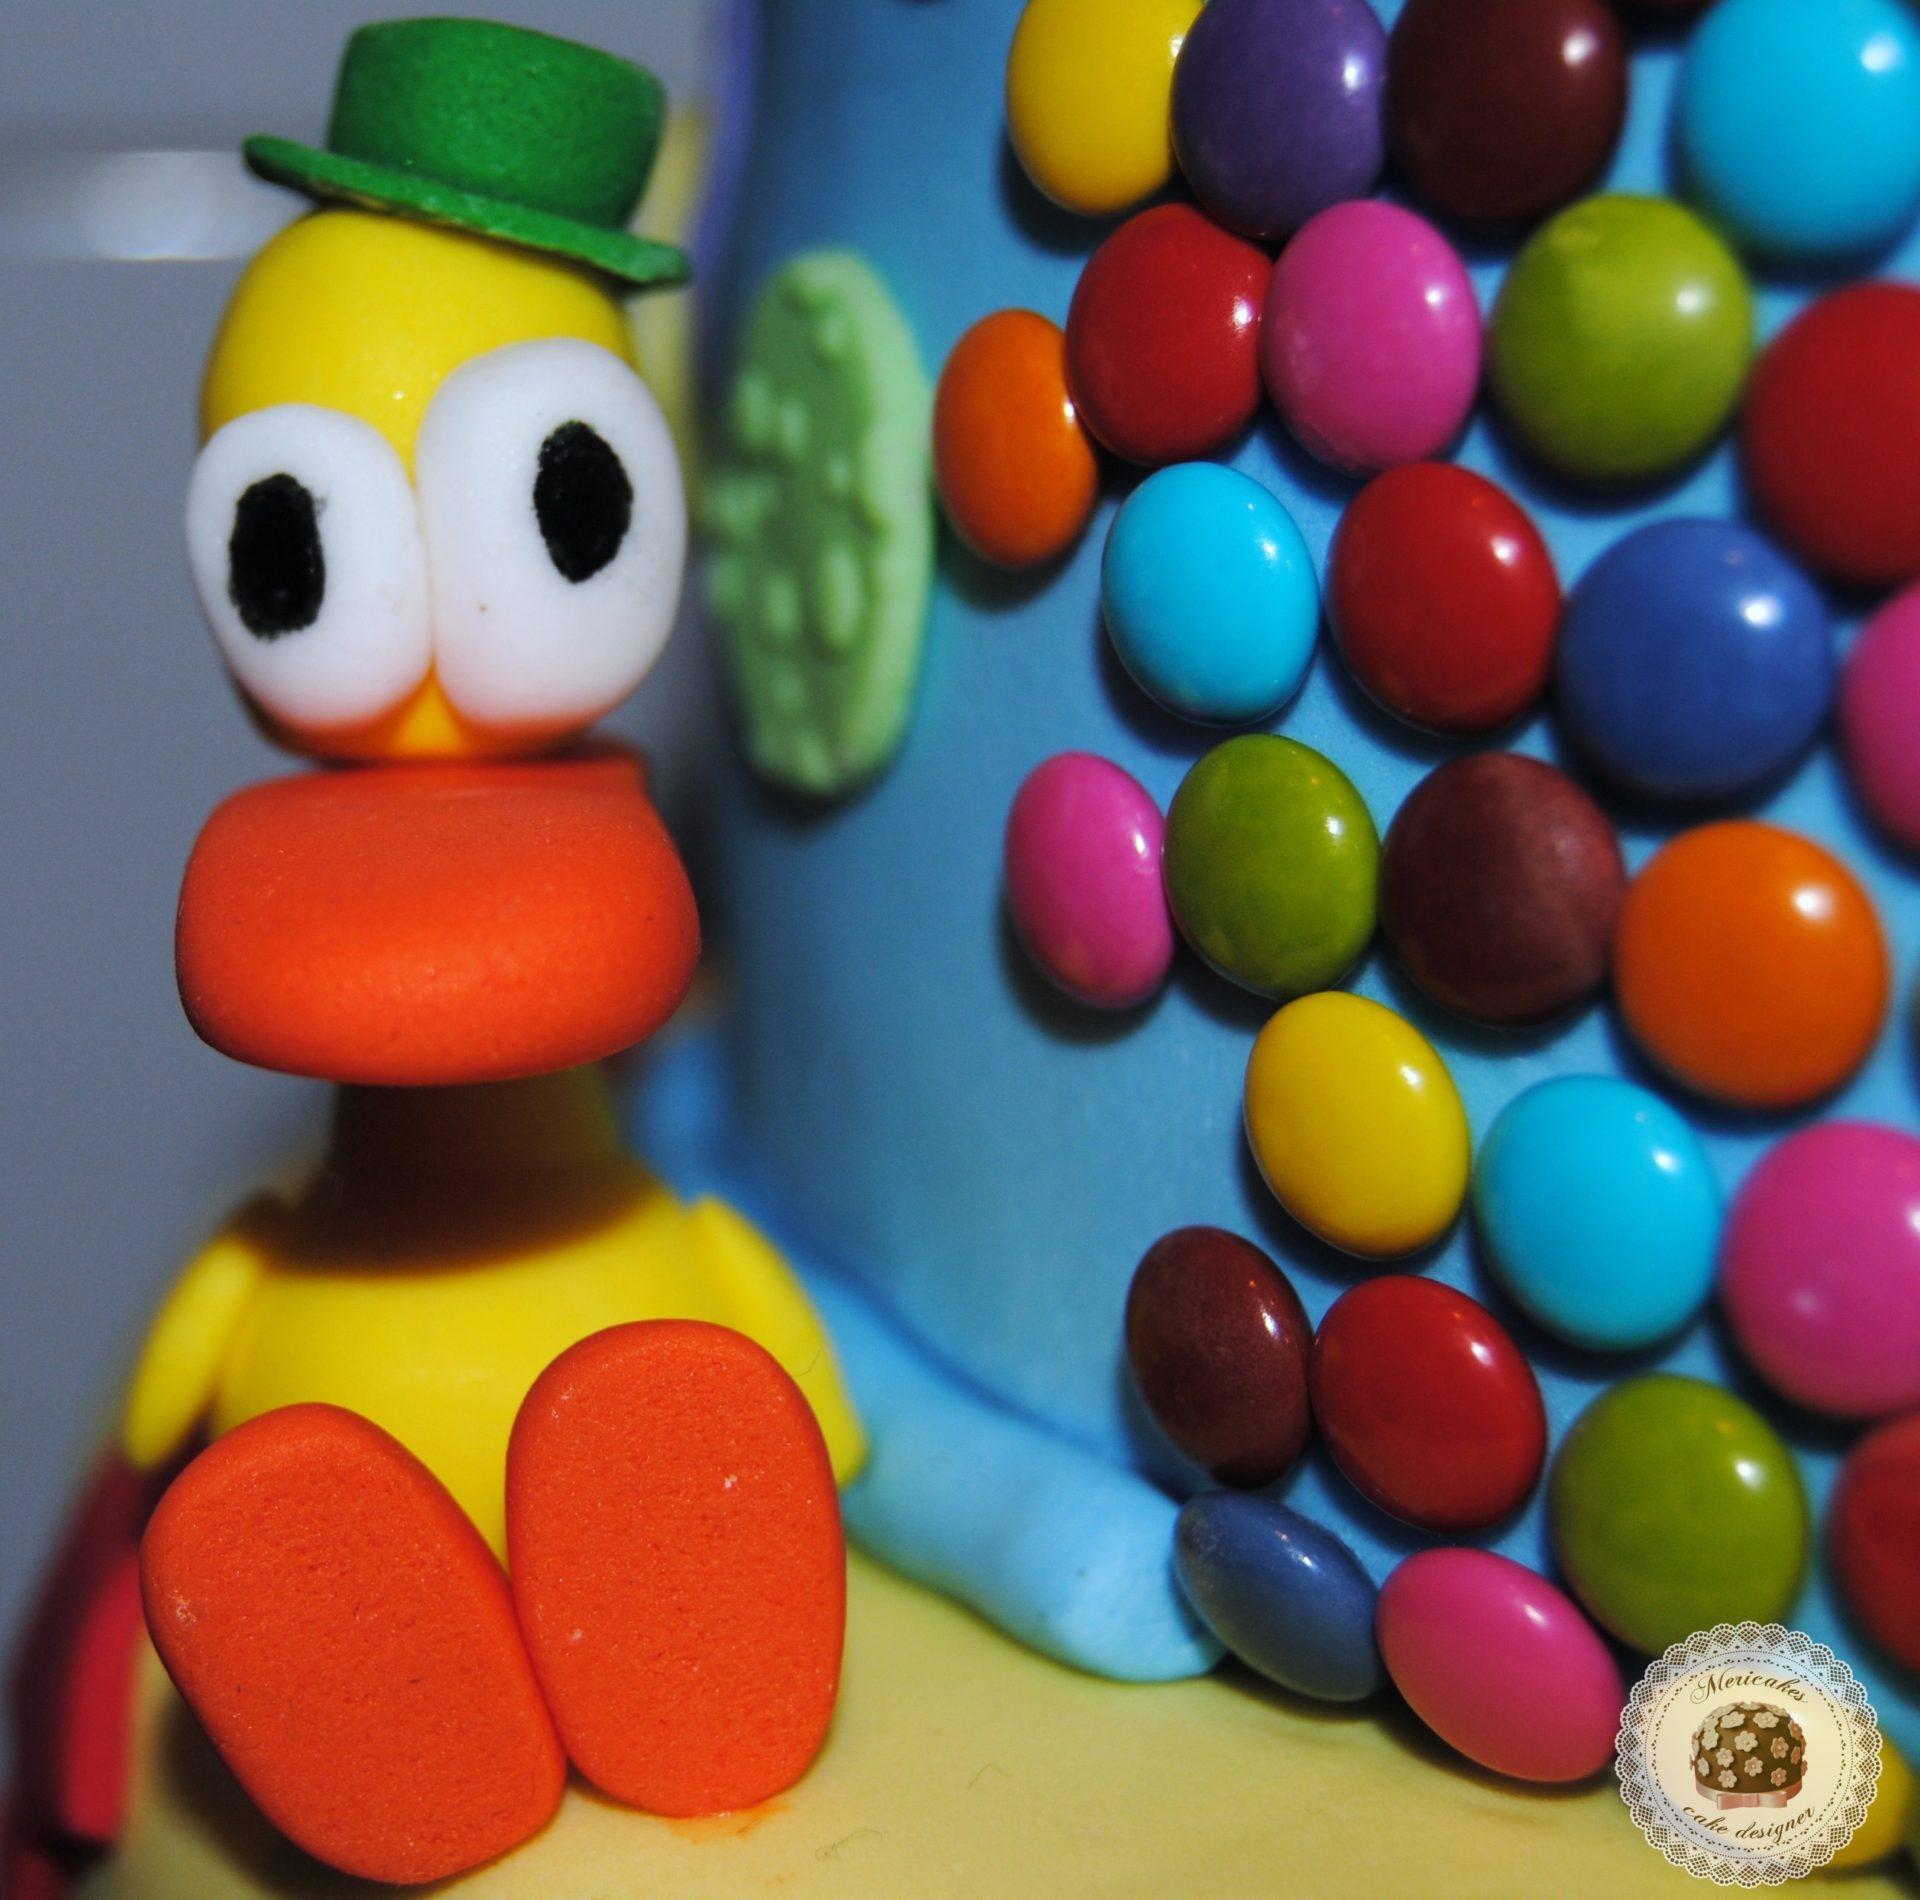 tarta-pocoyo-coche-eli-pato-tarta-fondant-barcelona-mericakes-sugarcraft-baby-cake-boy-cake